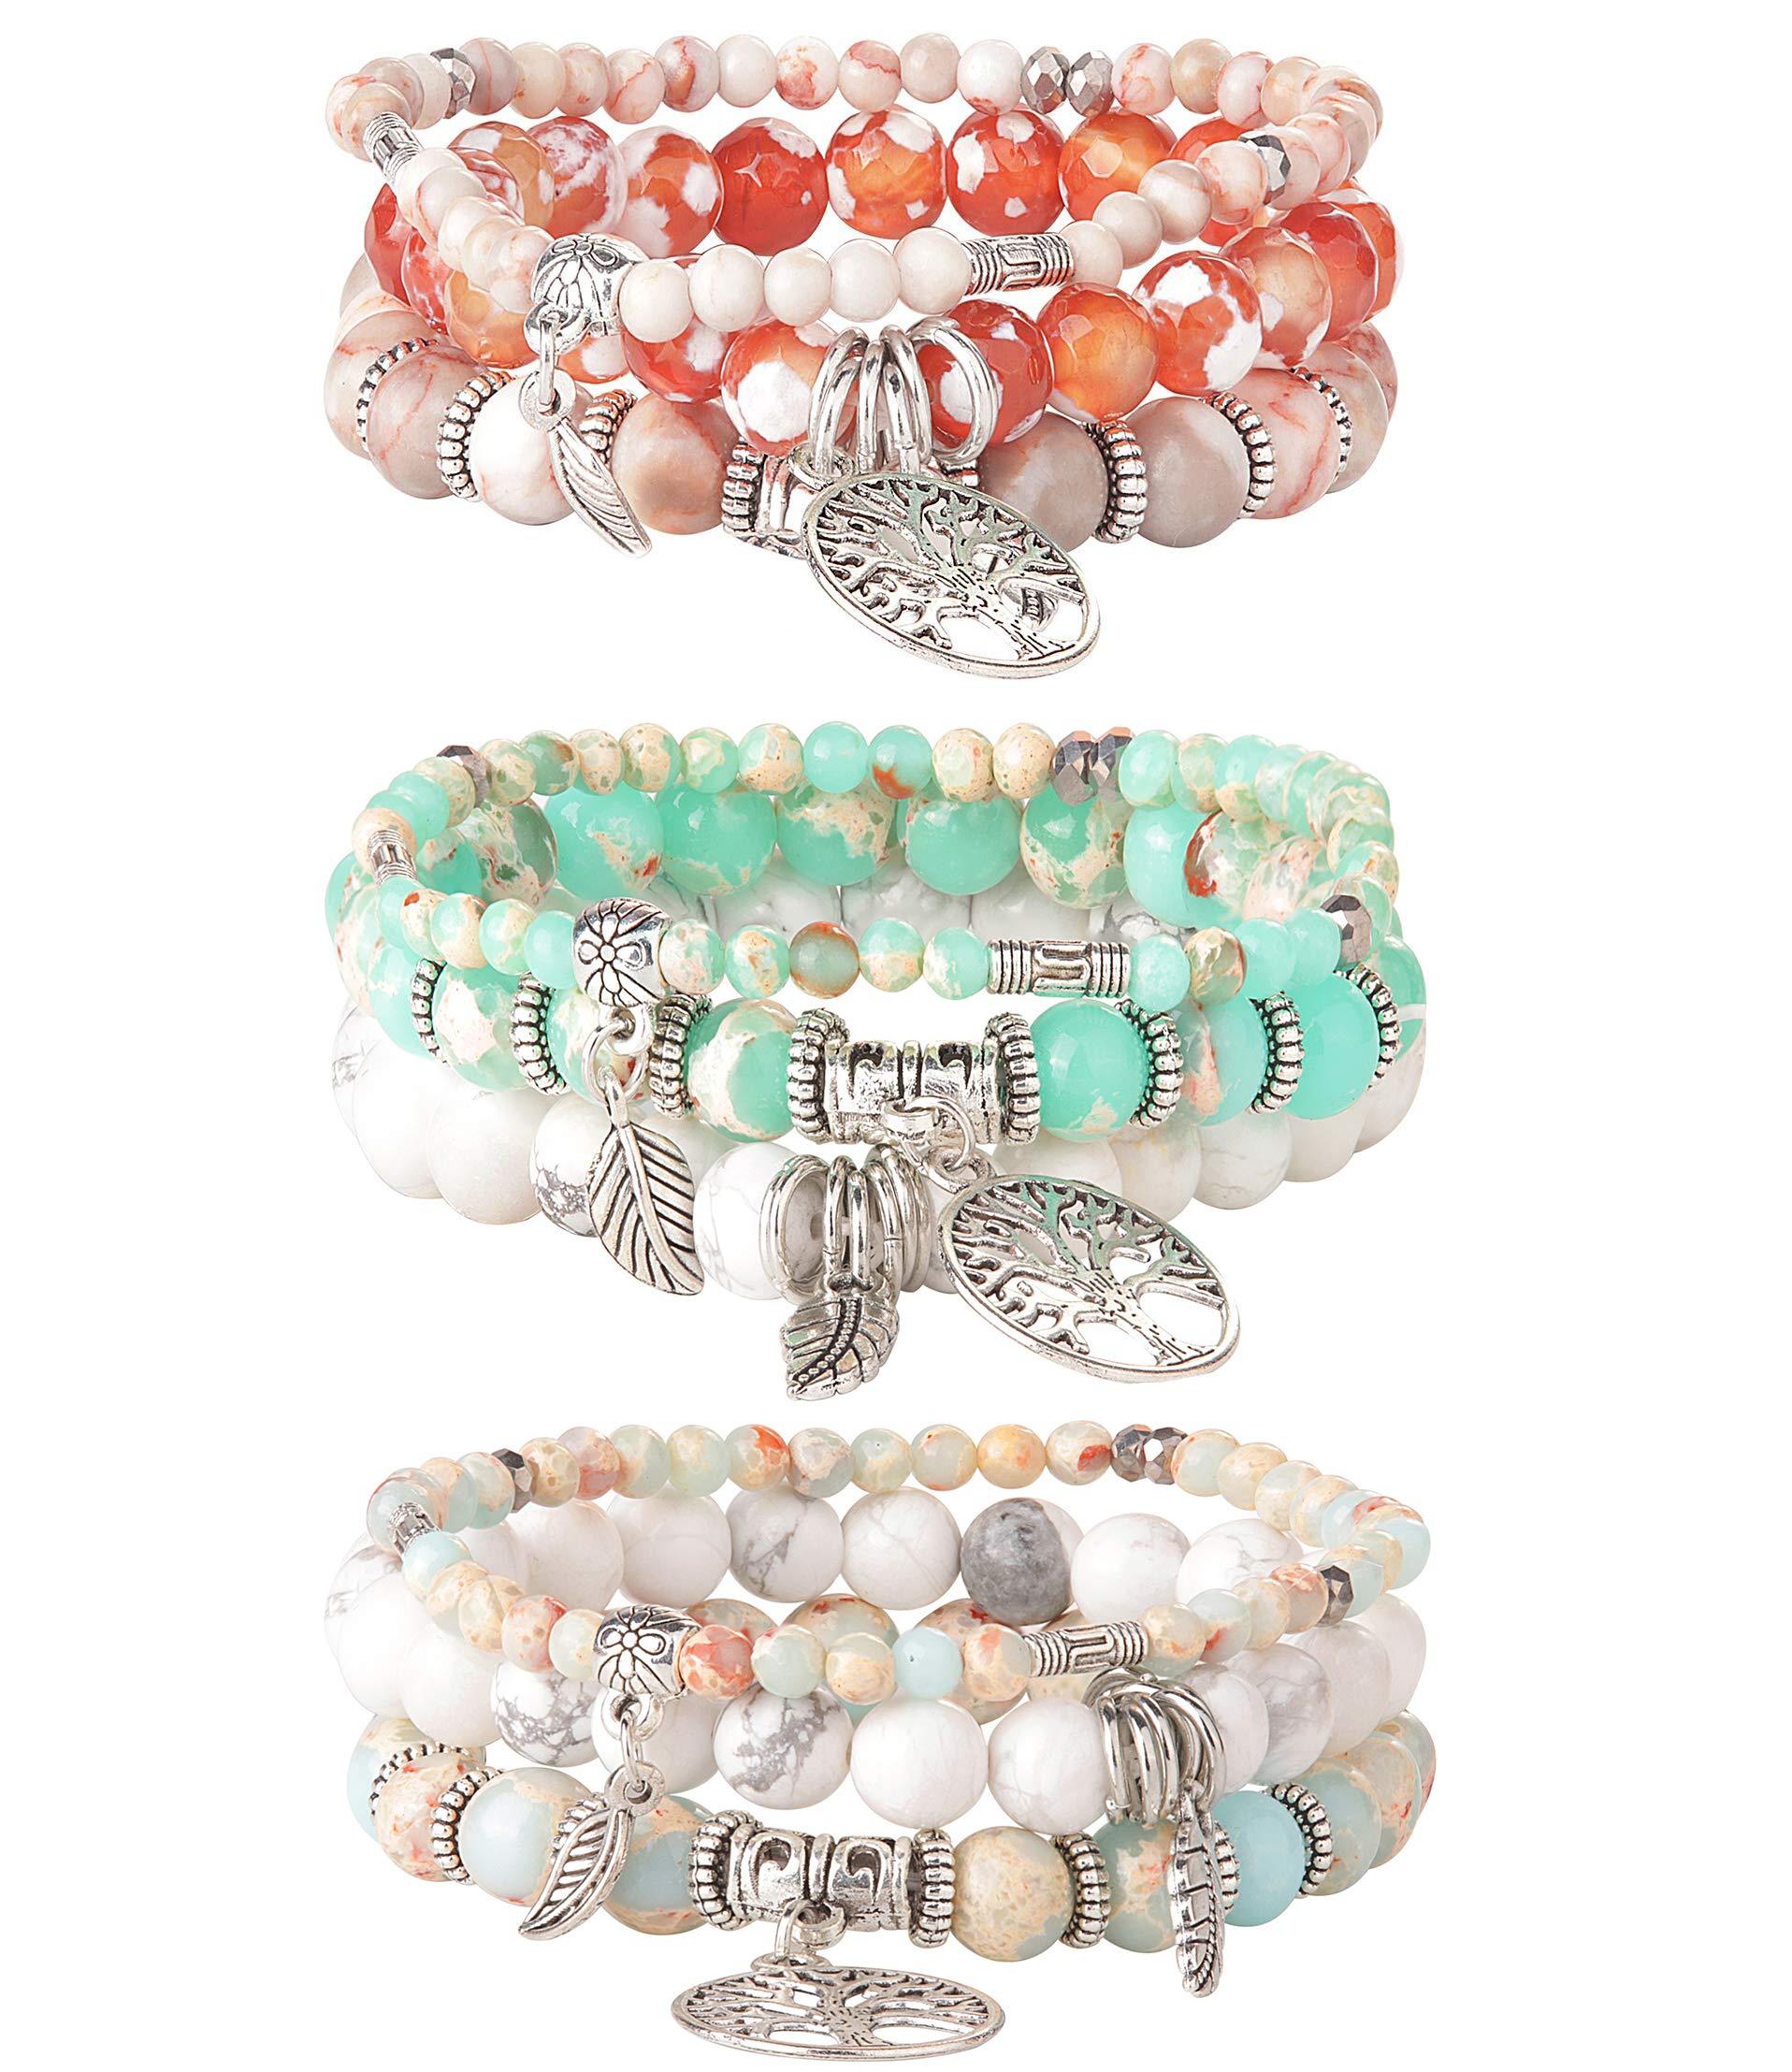 LOYALLOOK 3 Set Tree of Life Beaded Bracelet for Women Girls Couple Friends Bracelet Natural Stone Healing Yoga Bracelet Charm Chakra Bracelet Set by LOYALLOOK